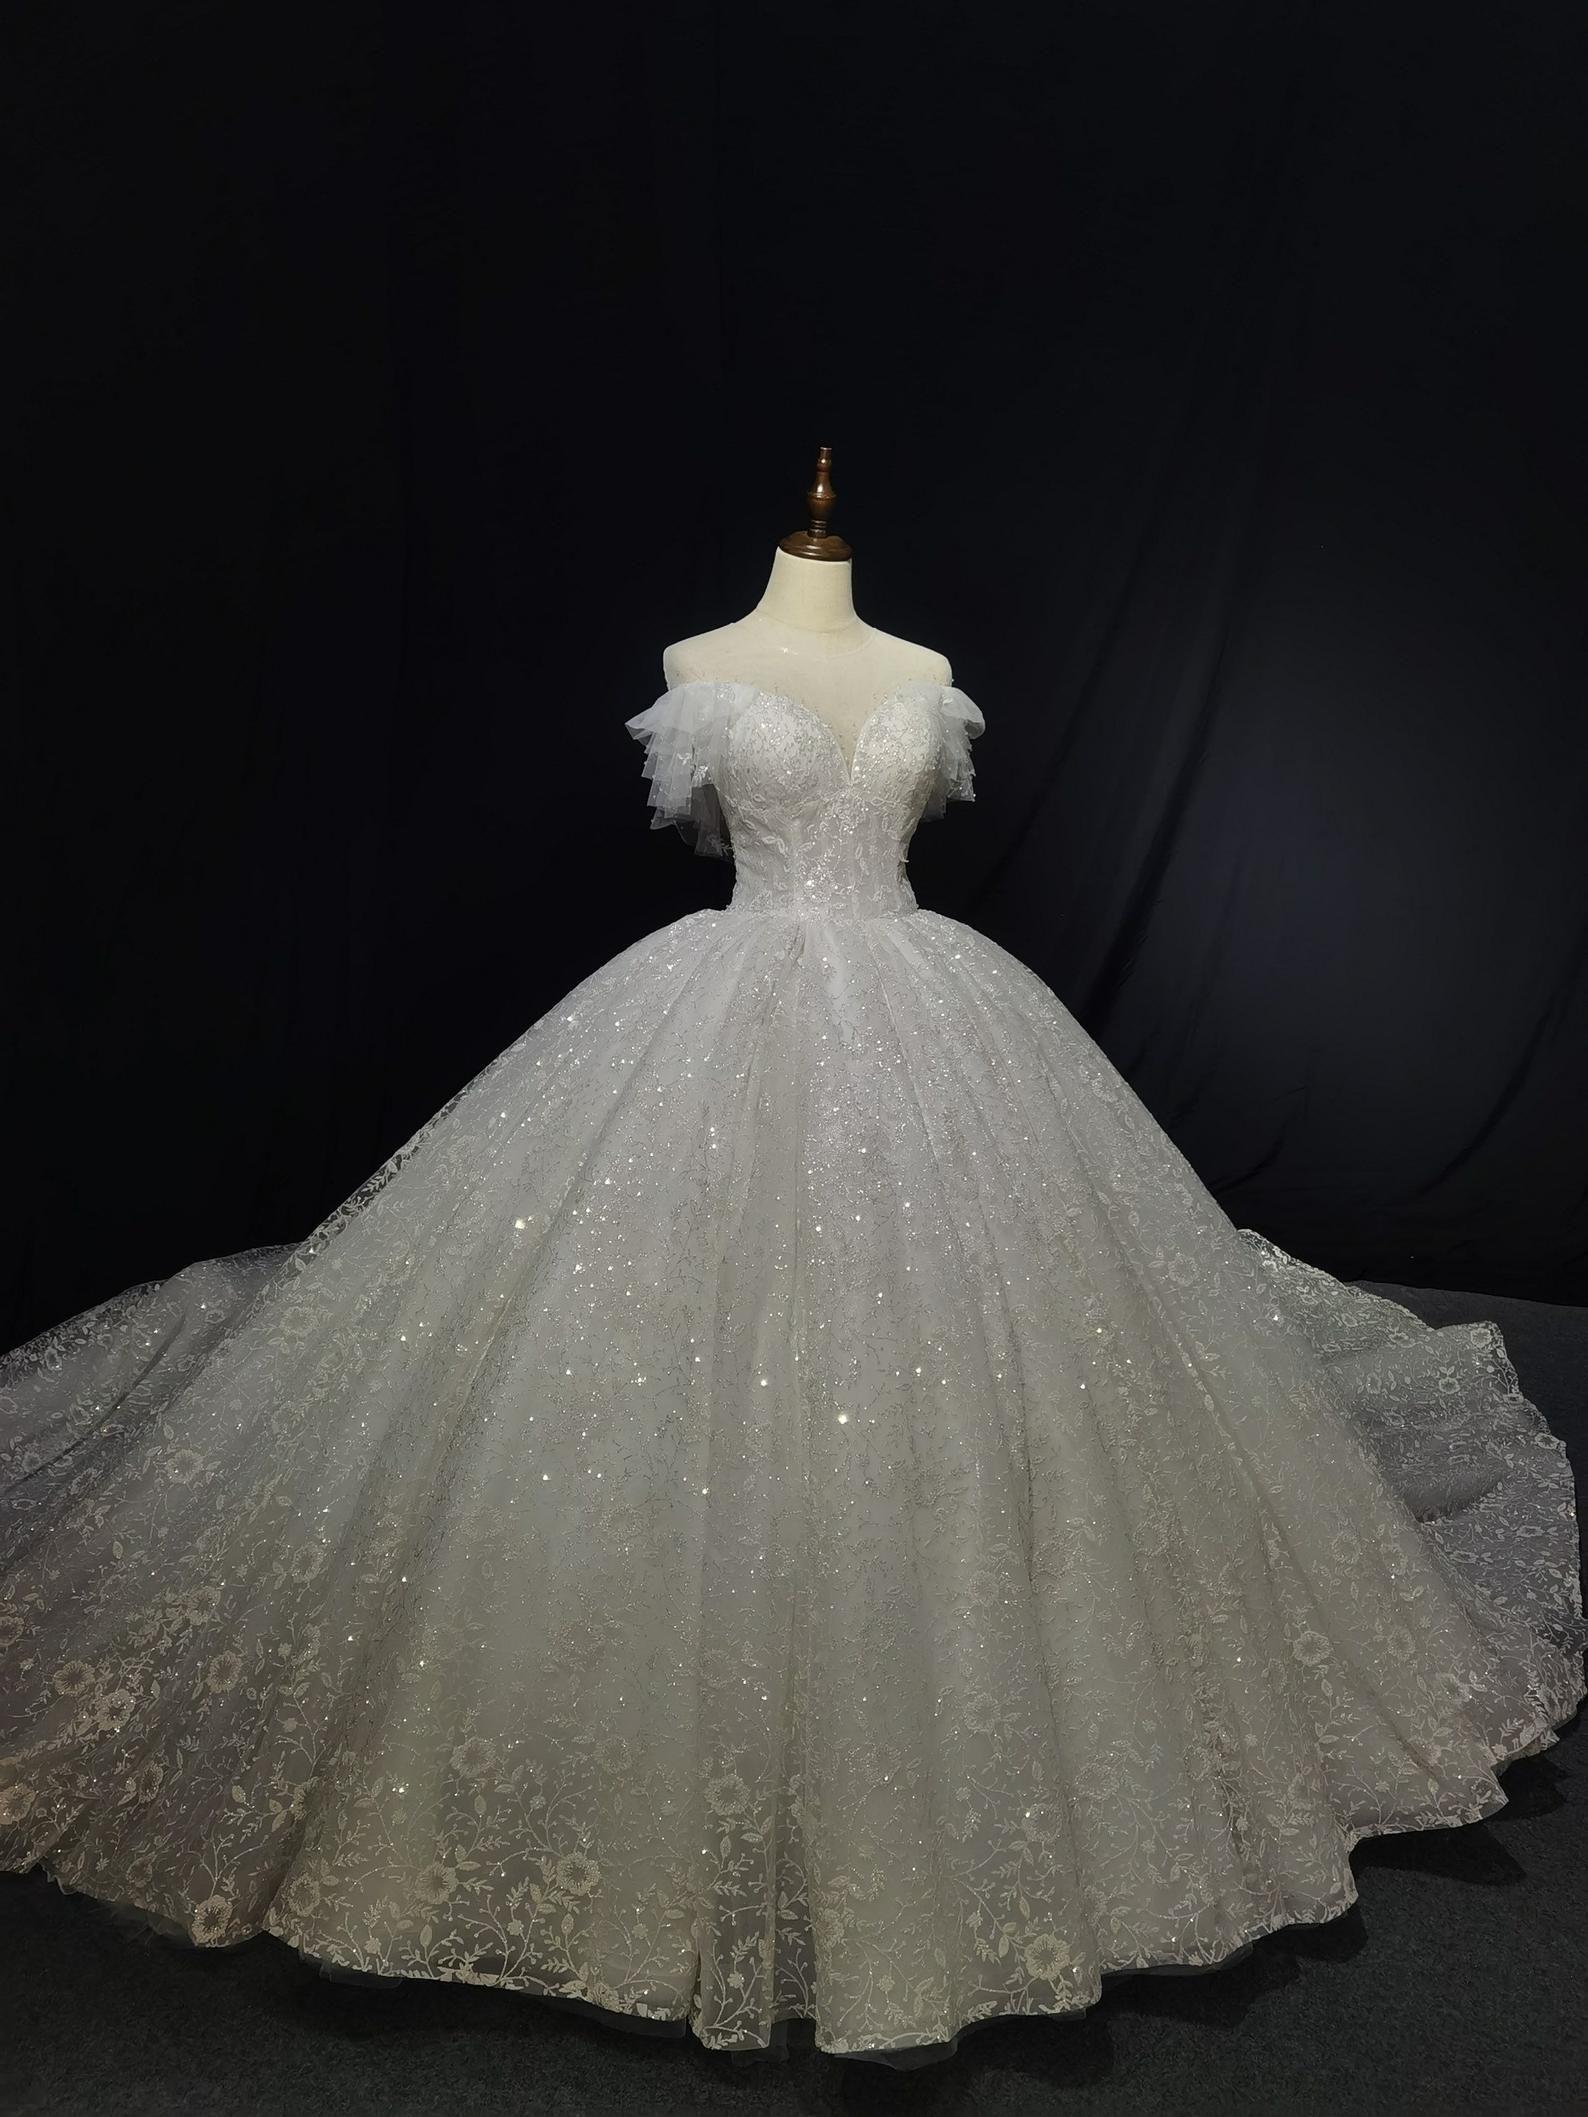 Luxury Bling Off The Shoulder With Ruffles Princess Ballgown Wedding Dress In 2021 Wedding Dresses Princess Ballgown Wedding Dresses Ball Gown Wedding Dress [ 2117 x 1588 Pixel ]